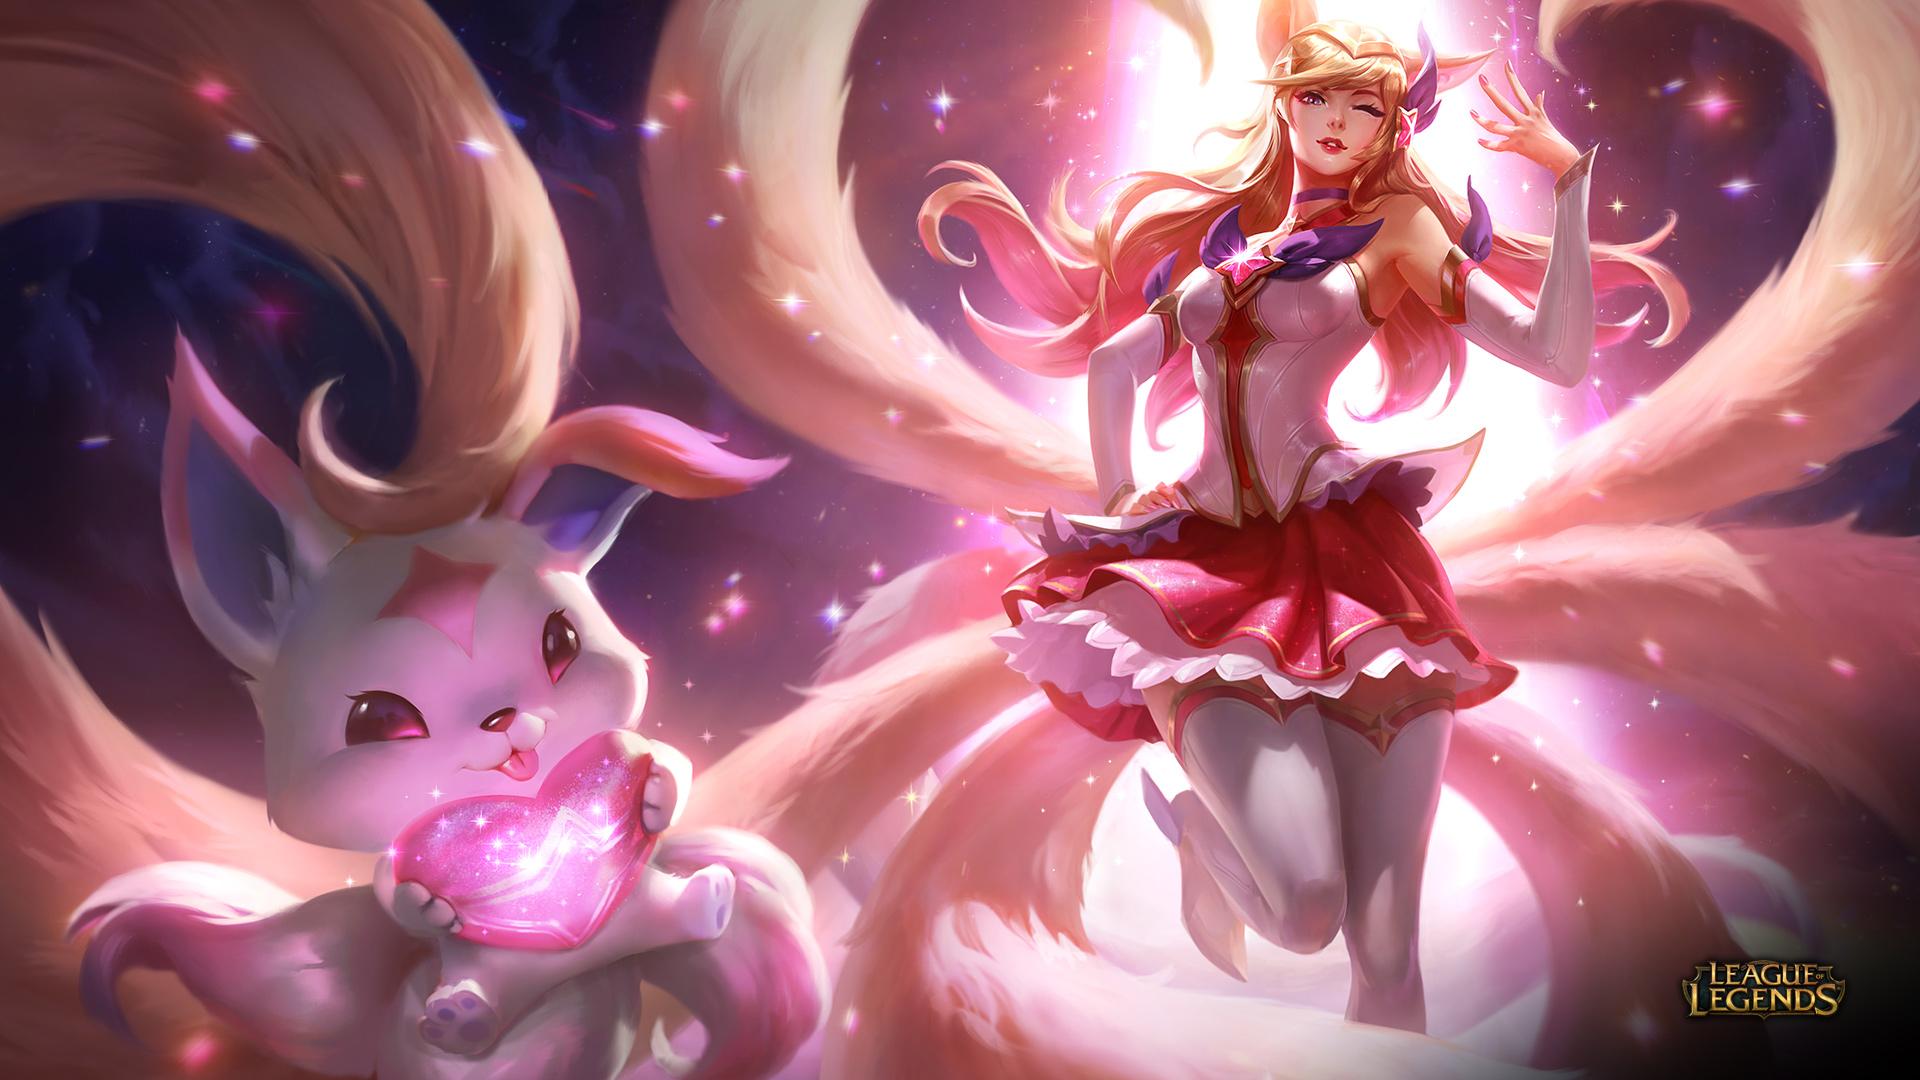 Anime Girl Thighs Wallpaper Hd League Of Legends Full Hd Papel De Parede And Planos De